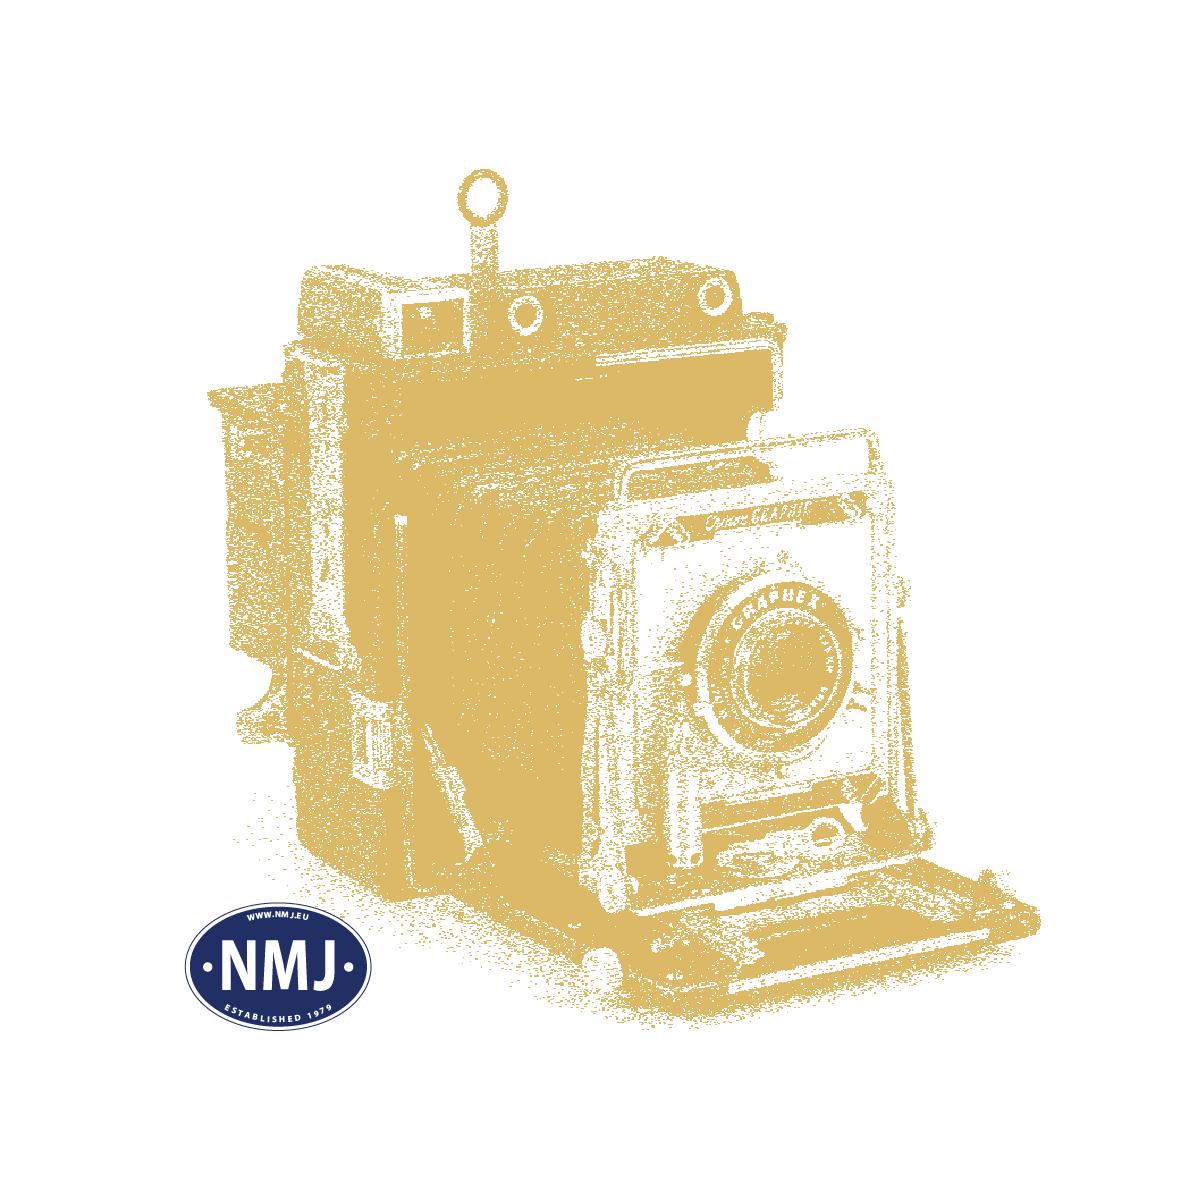 NMJT90301 - NMJ Topline CFL Diesellok 1602 (1971 -->), DC